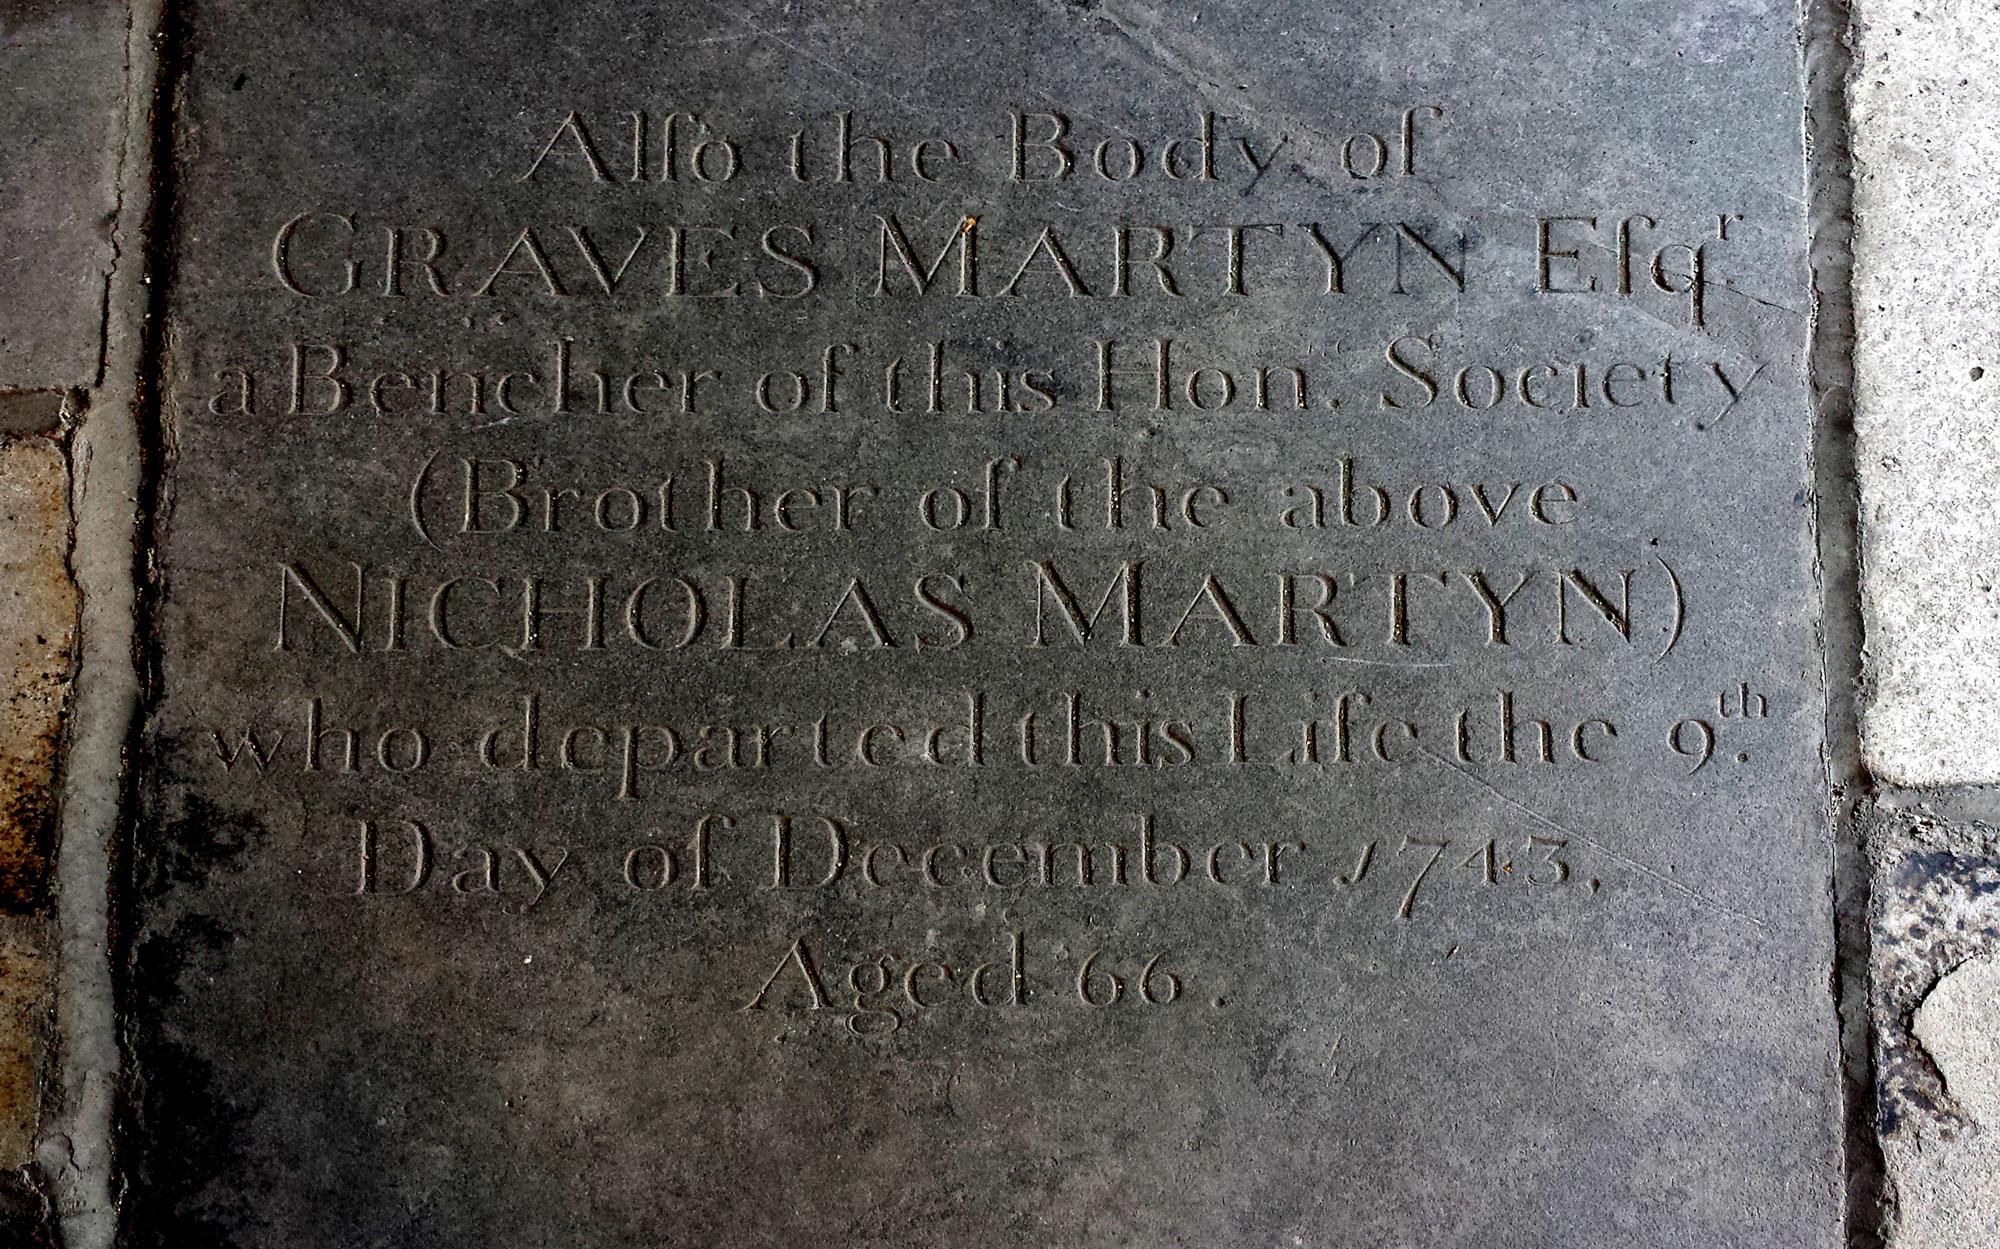 Interred in 1743